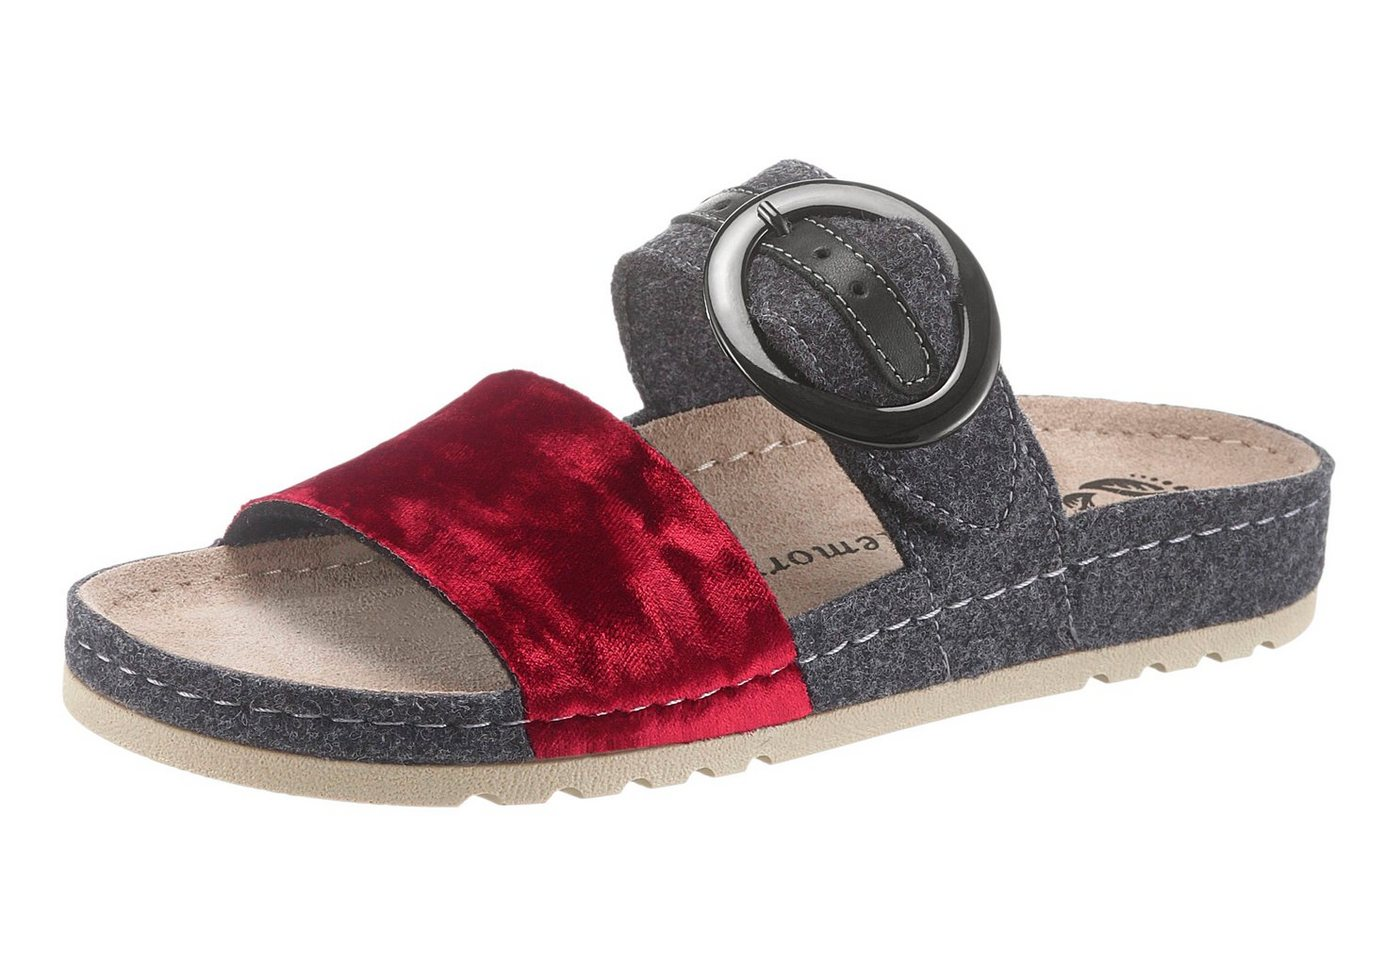 Mubb Pantolette mit komfortablem Gel Memory-Fußbett | Schuhe > Clogs & Pantoletten | Grau | Pu | MUBB